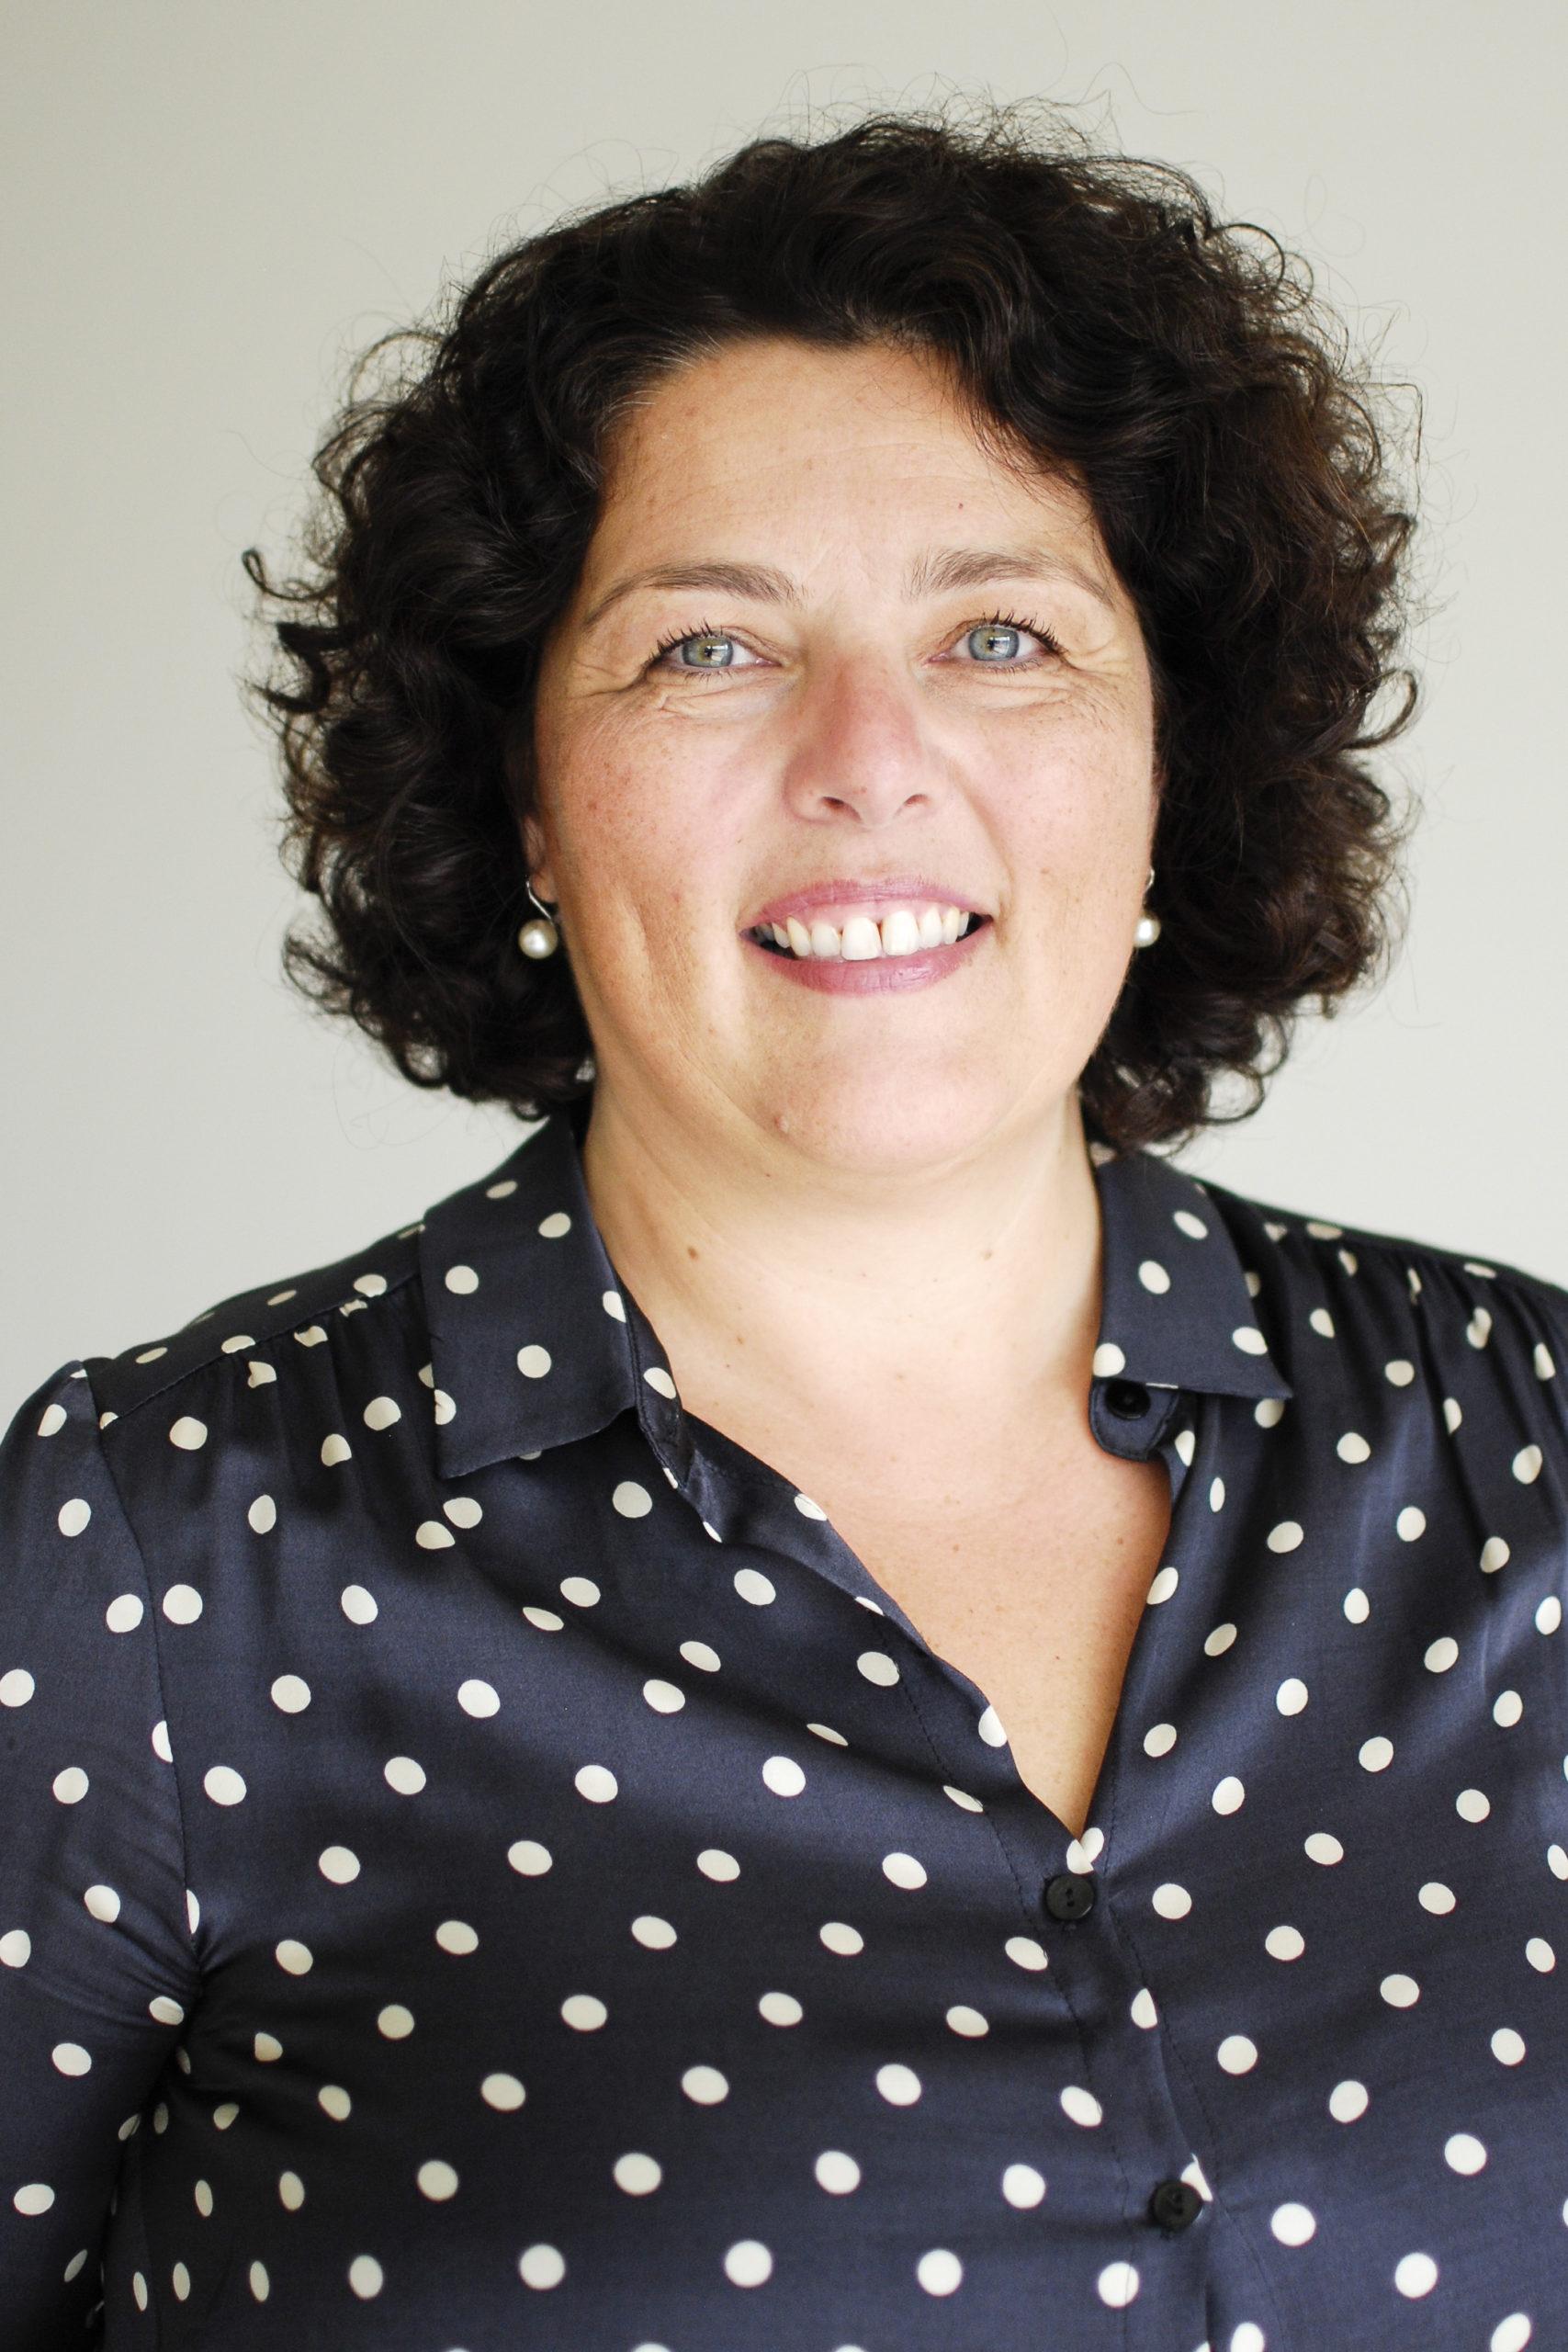 Nathalie De Smet